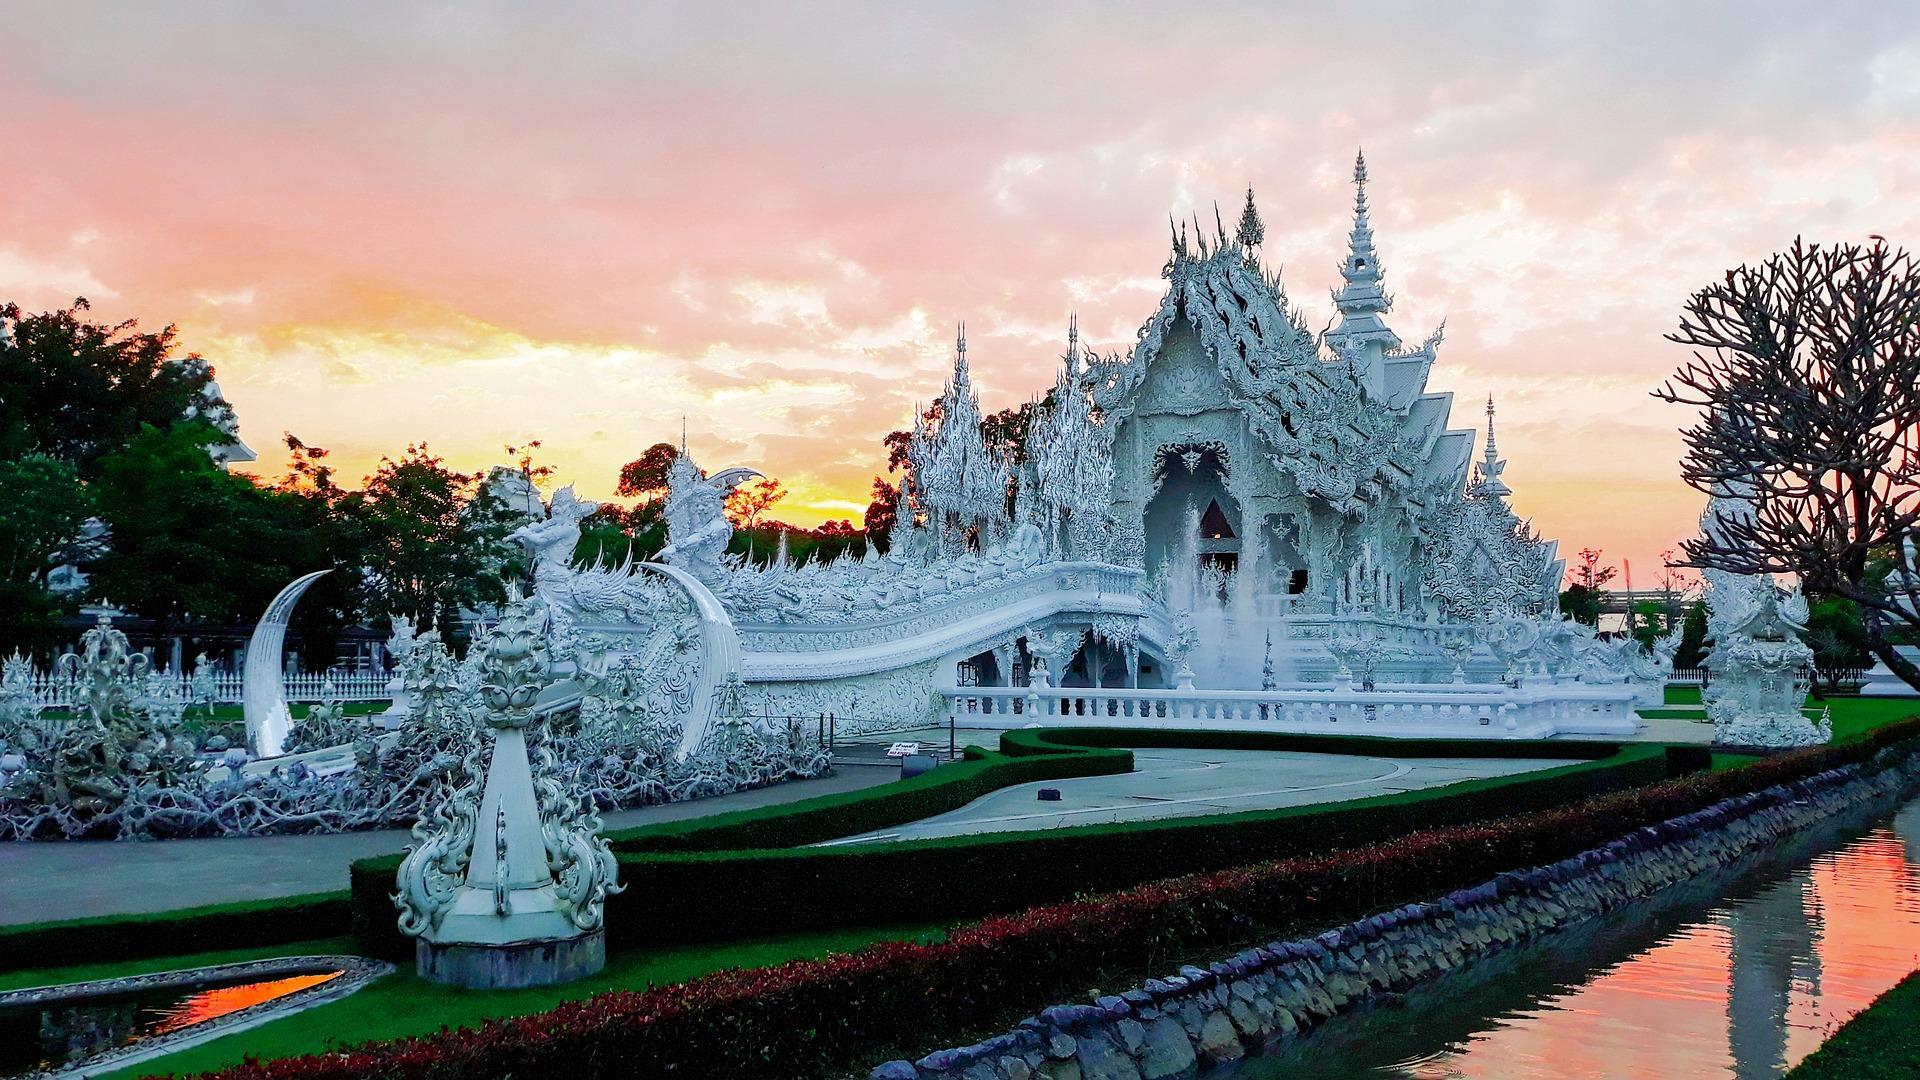 /optitravel/online/www/layout22/single_product.php?pkt_id=52&Produto=Tailândia Clássica&destino=TAILÂNDIA